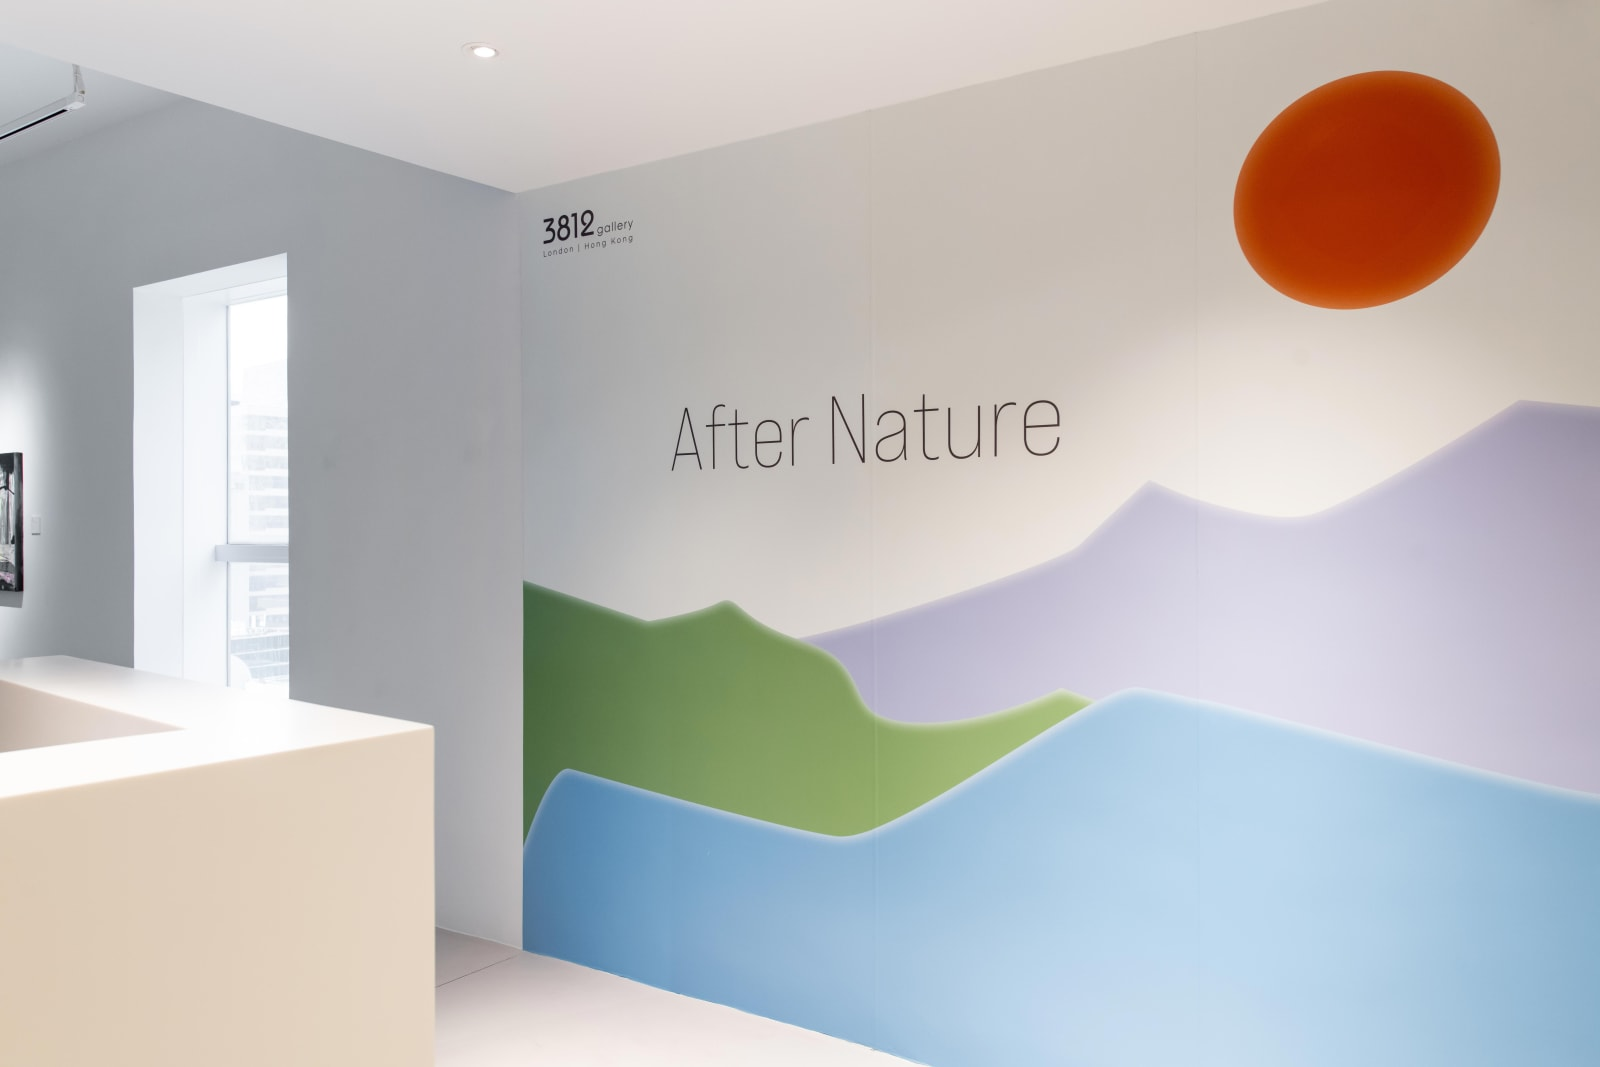 After Nature: Part I